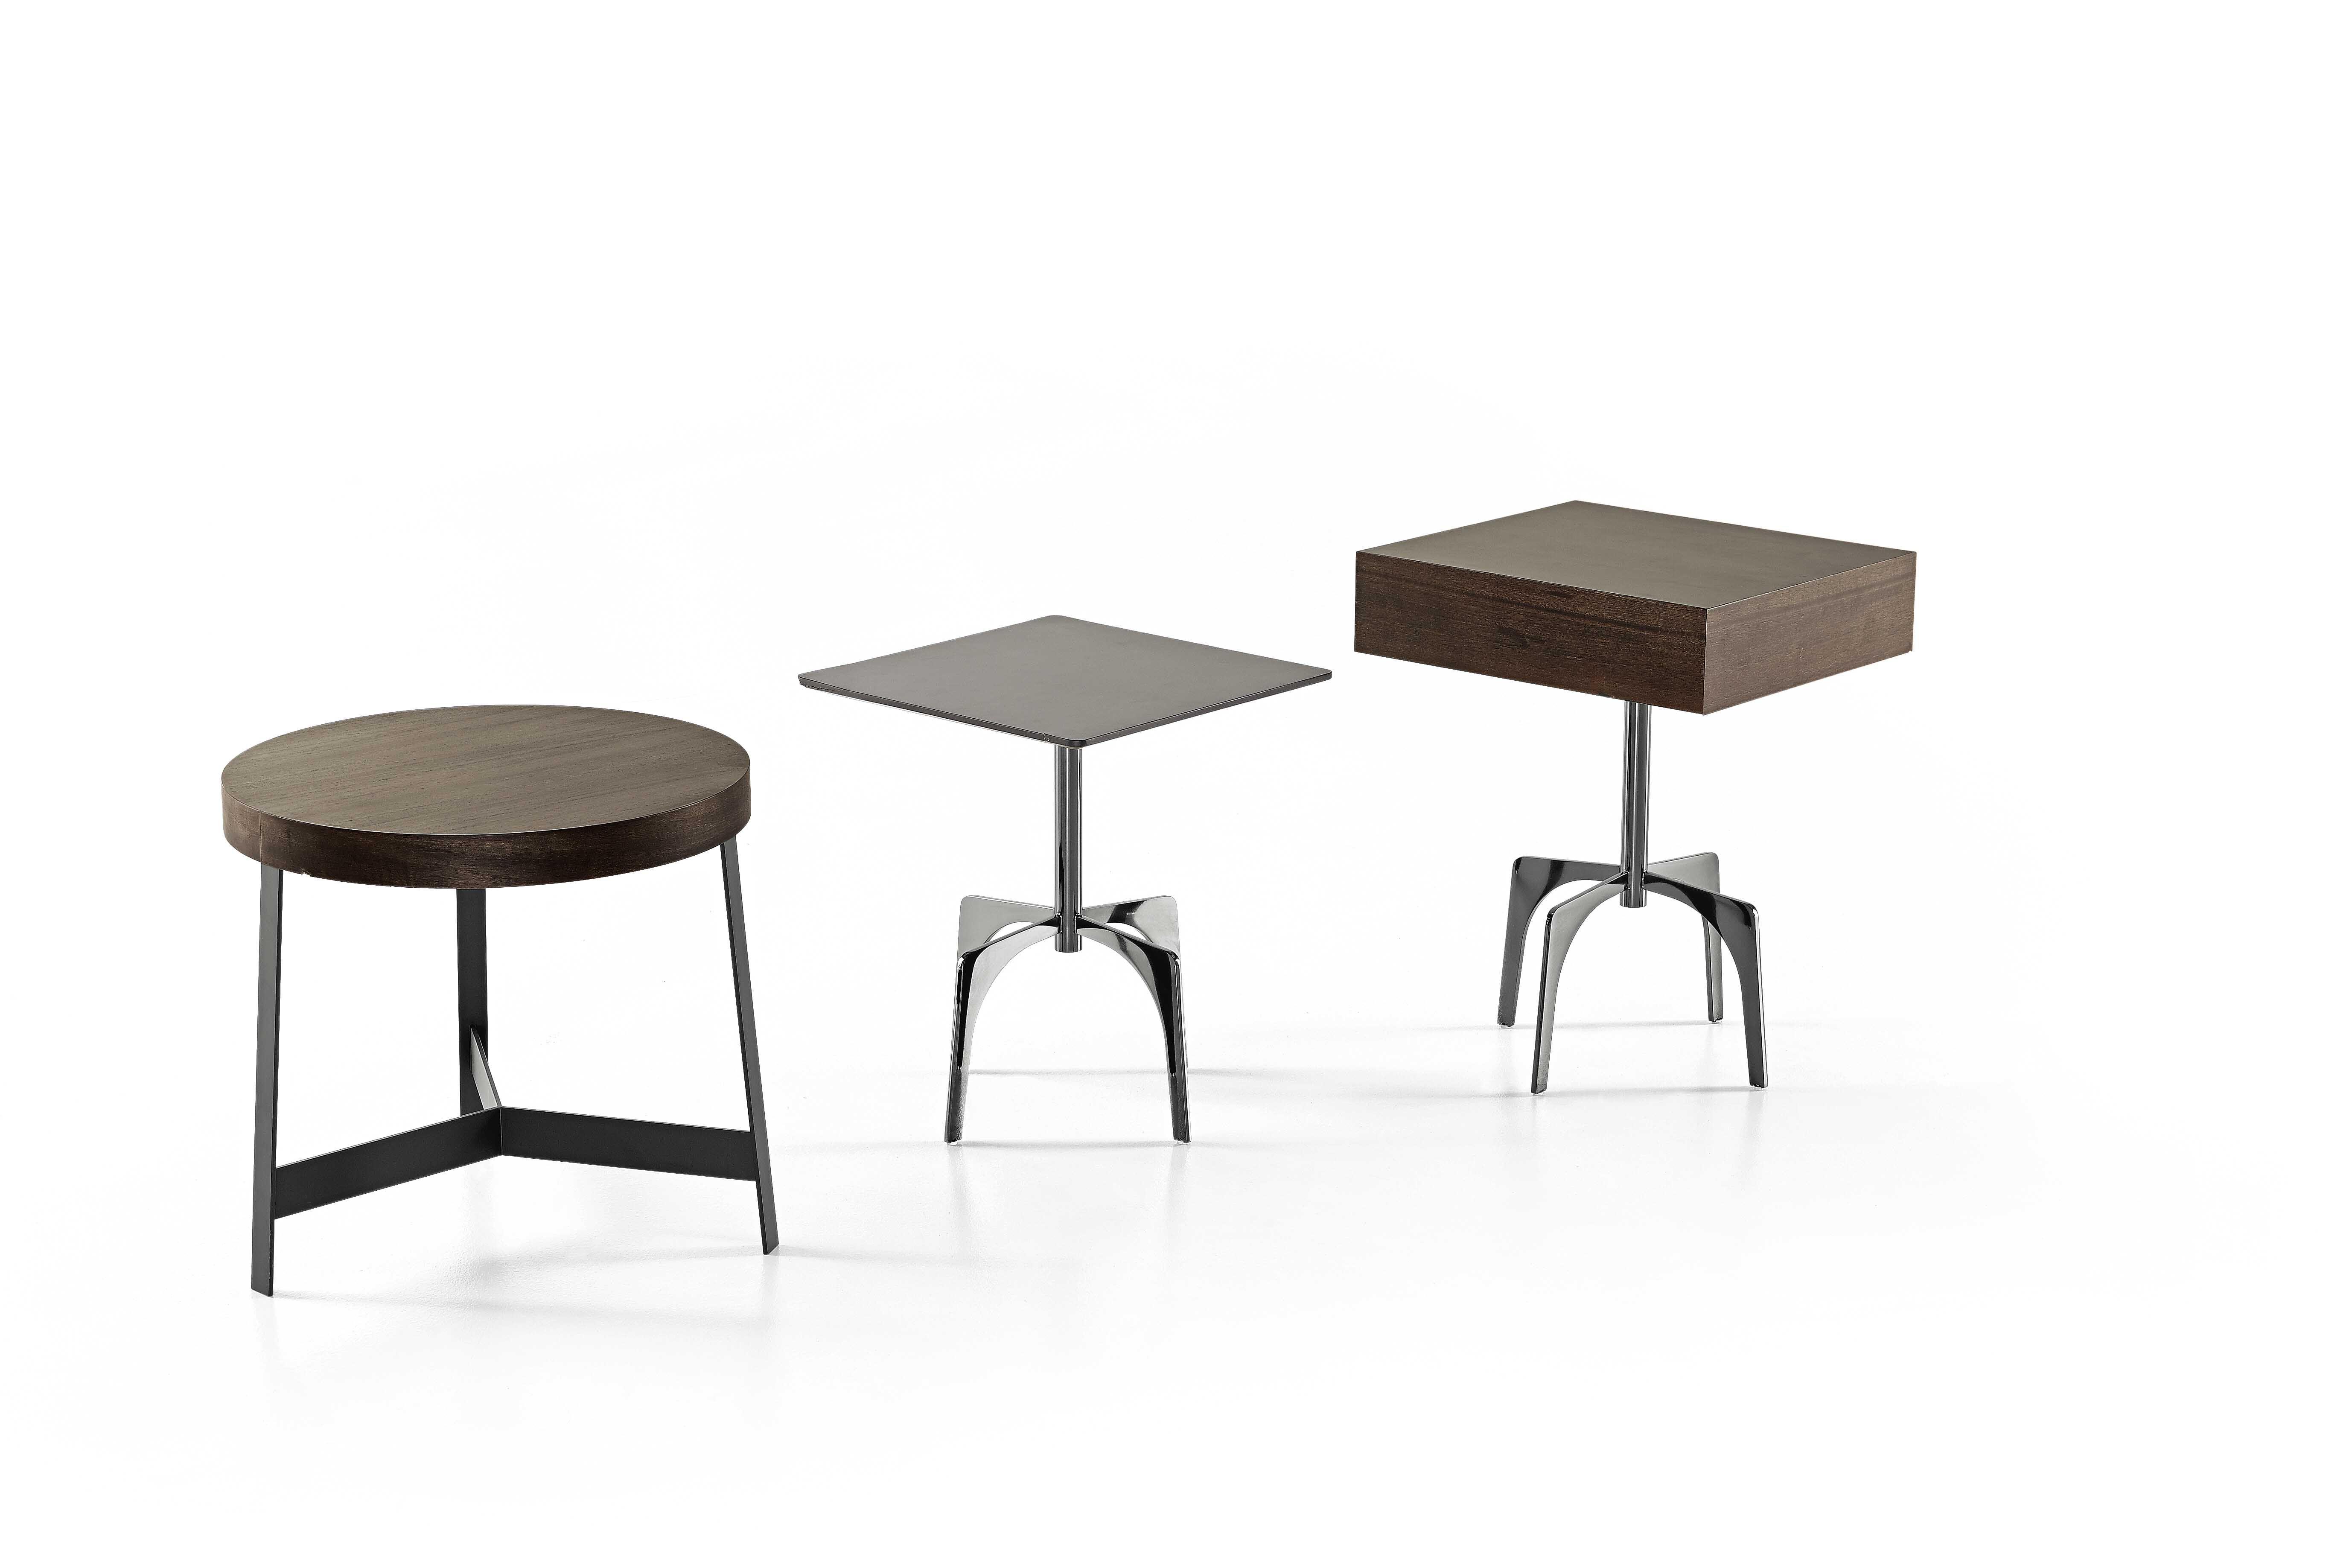 Kanaha coffee table with eucalyptus plane and bronzed brown base